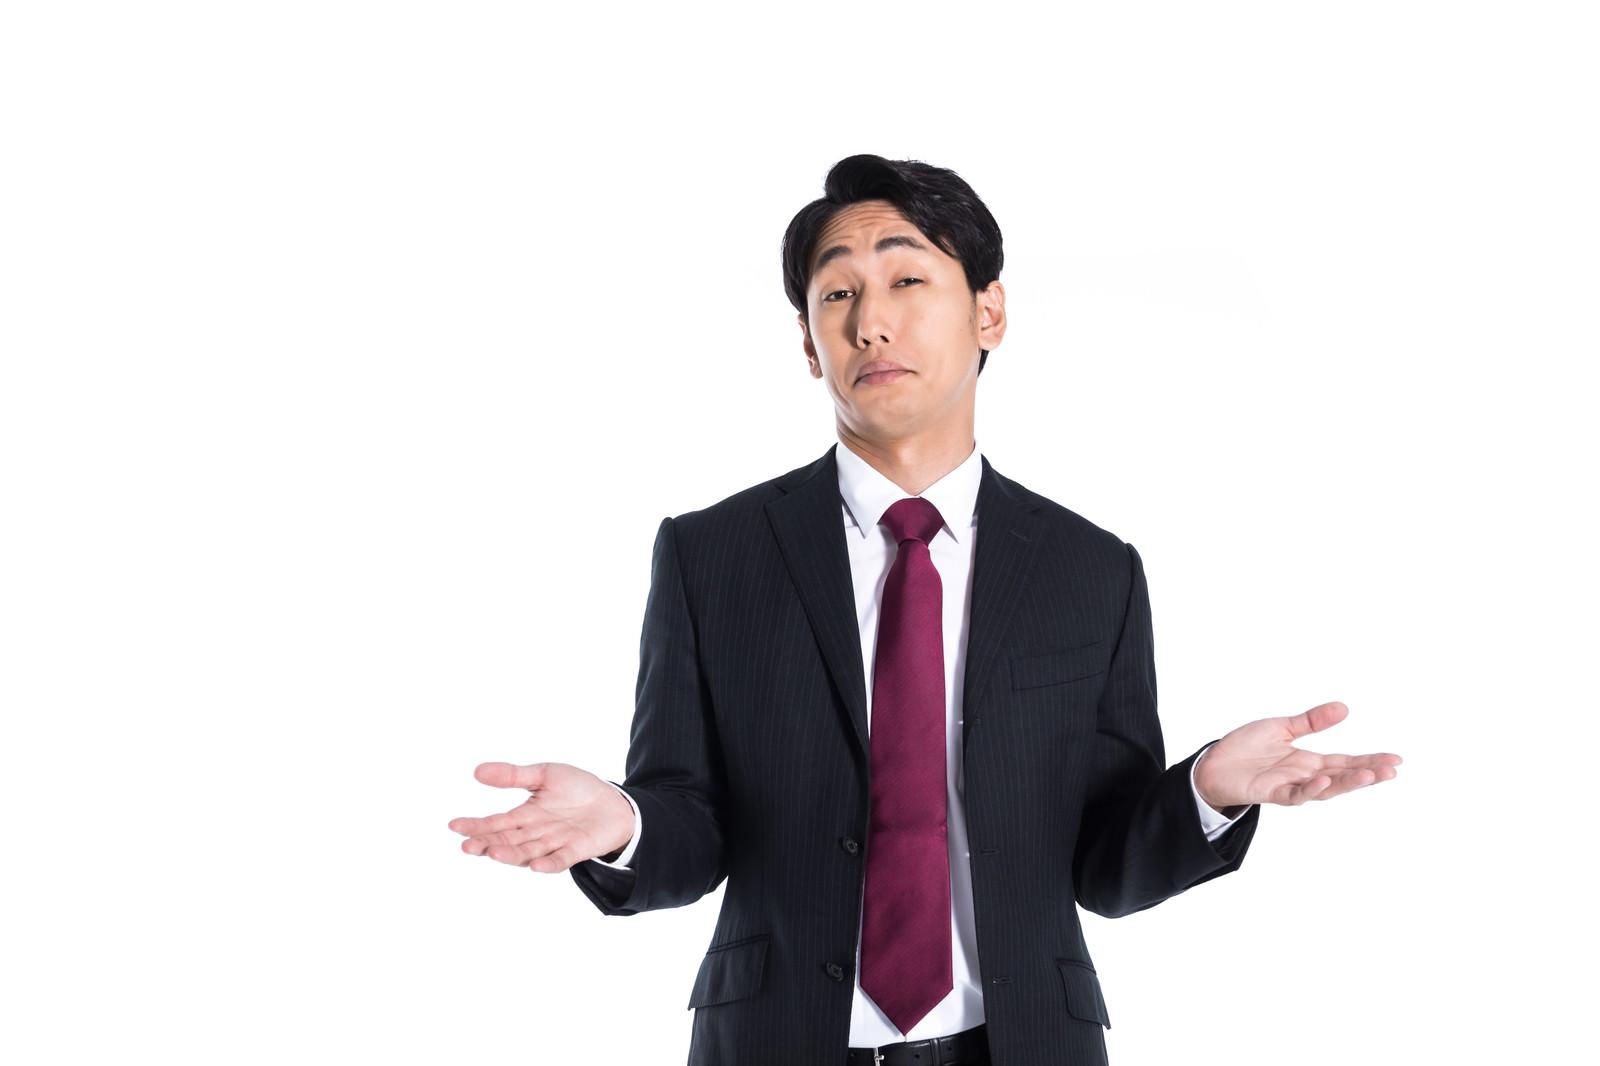 「NO~NO~ オーバーリアクションを取る男性」の写真[モデル:大川竜弥]